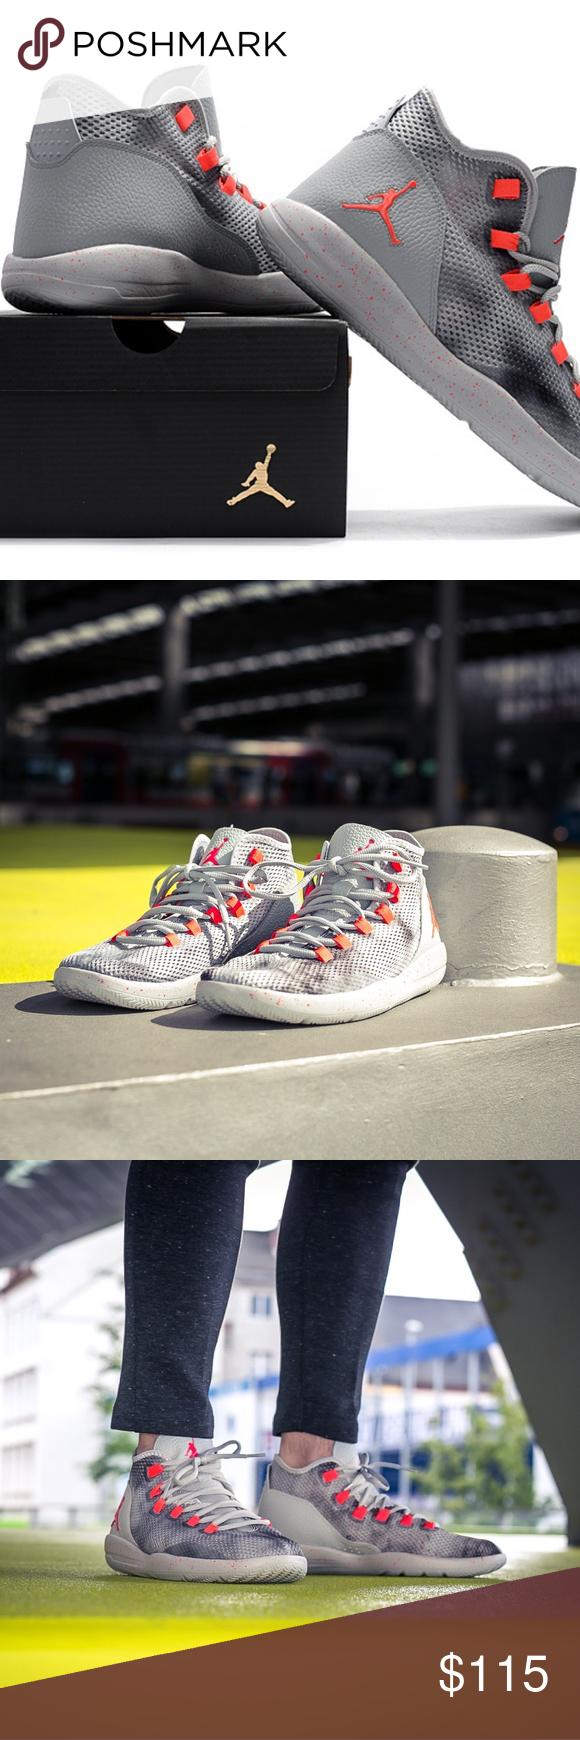 cb36991905b Nike Jordan Reveal Premium Men's Size 11 Brand New With Original Box Nike  Jordan Reveal Premium Jordan Shoes Athletic Shoes